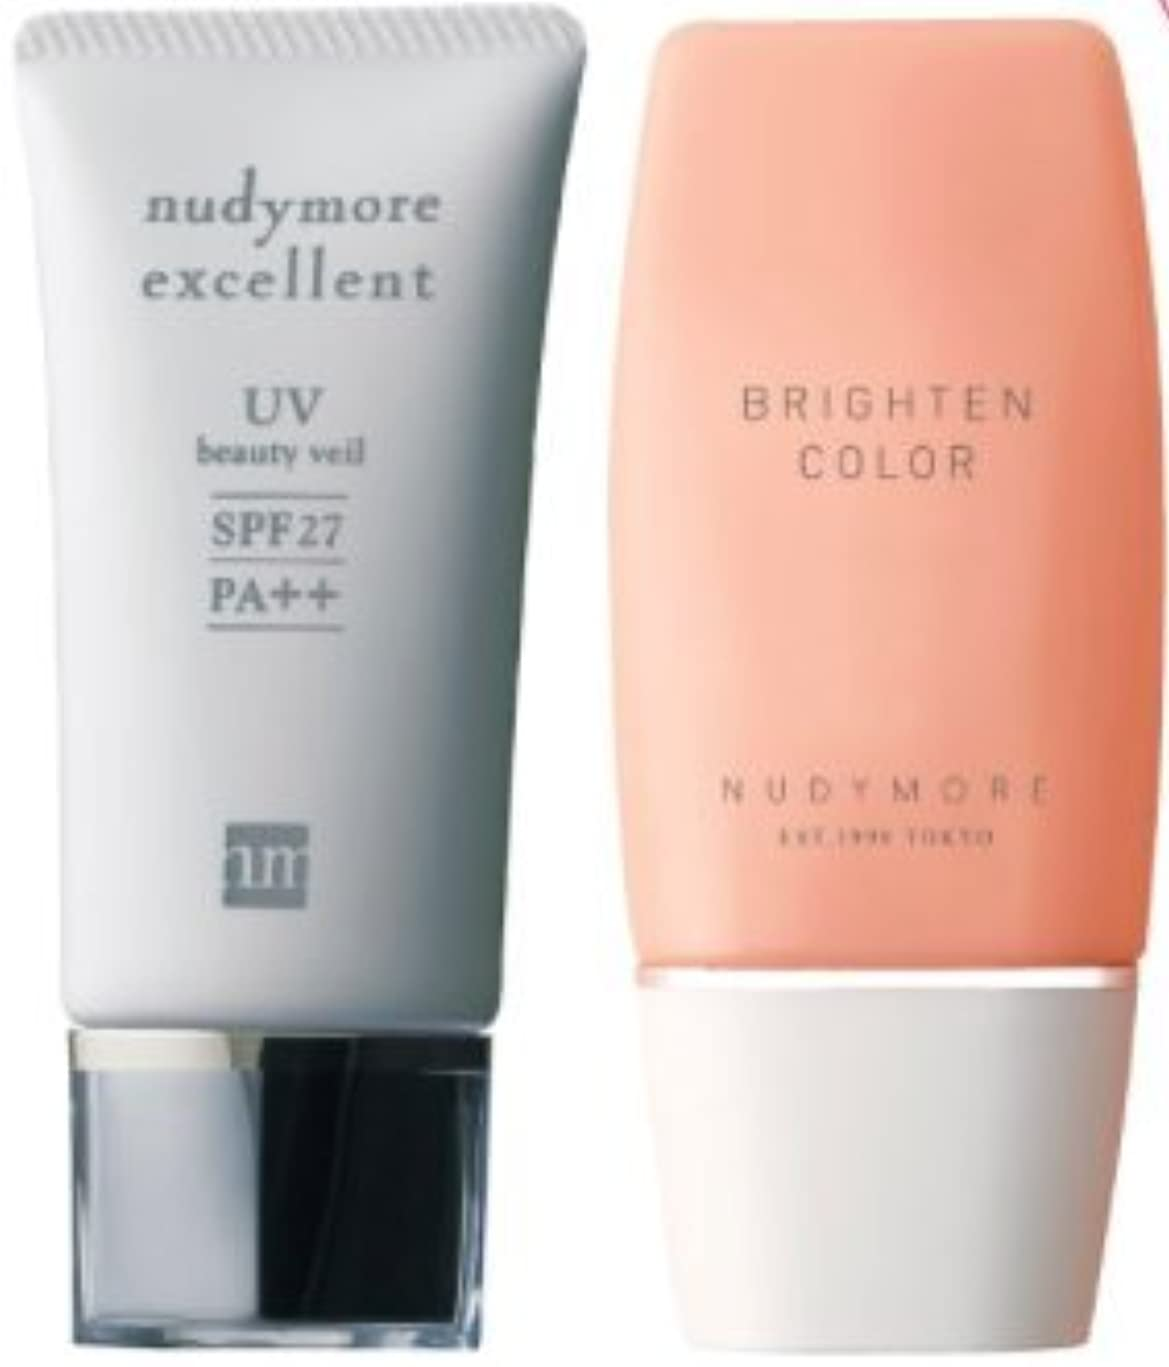 nudymore(ヌーディモア) ブライトンカラーUV&UVビューティーヴェール セット(肌質自在W下地セット